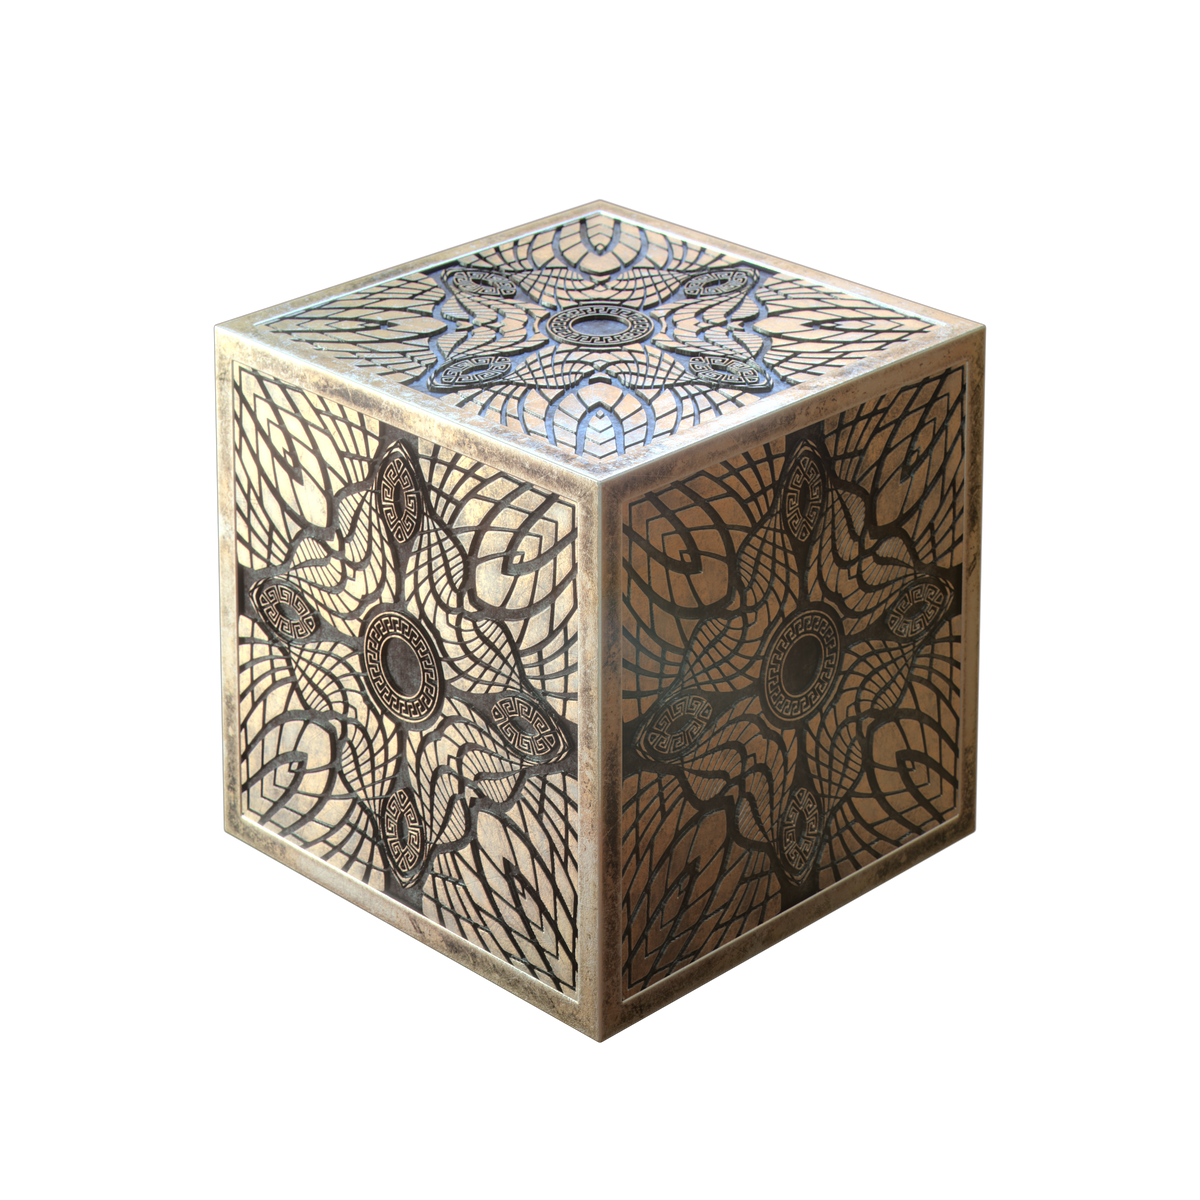 3D Jewelry Cube - Pattern E